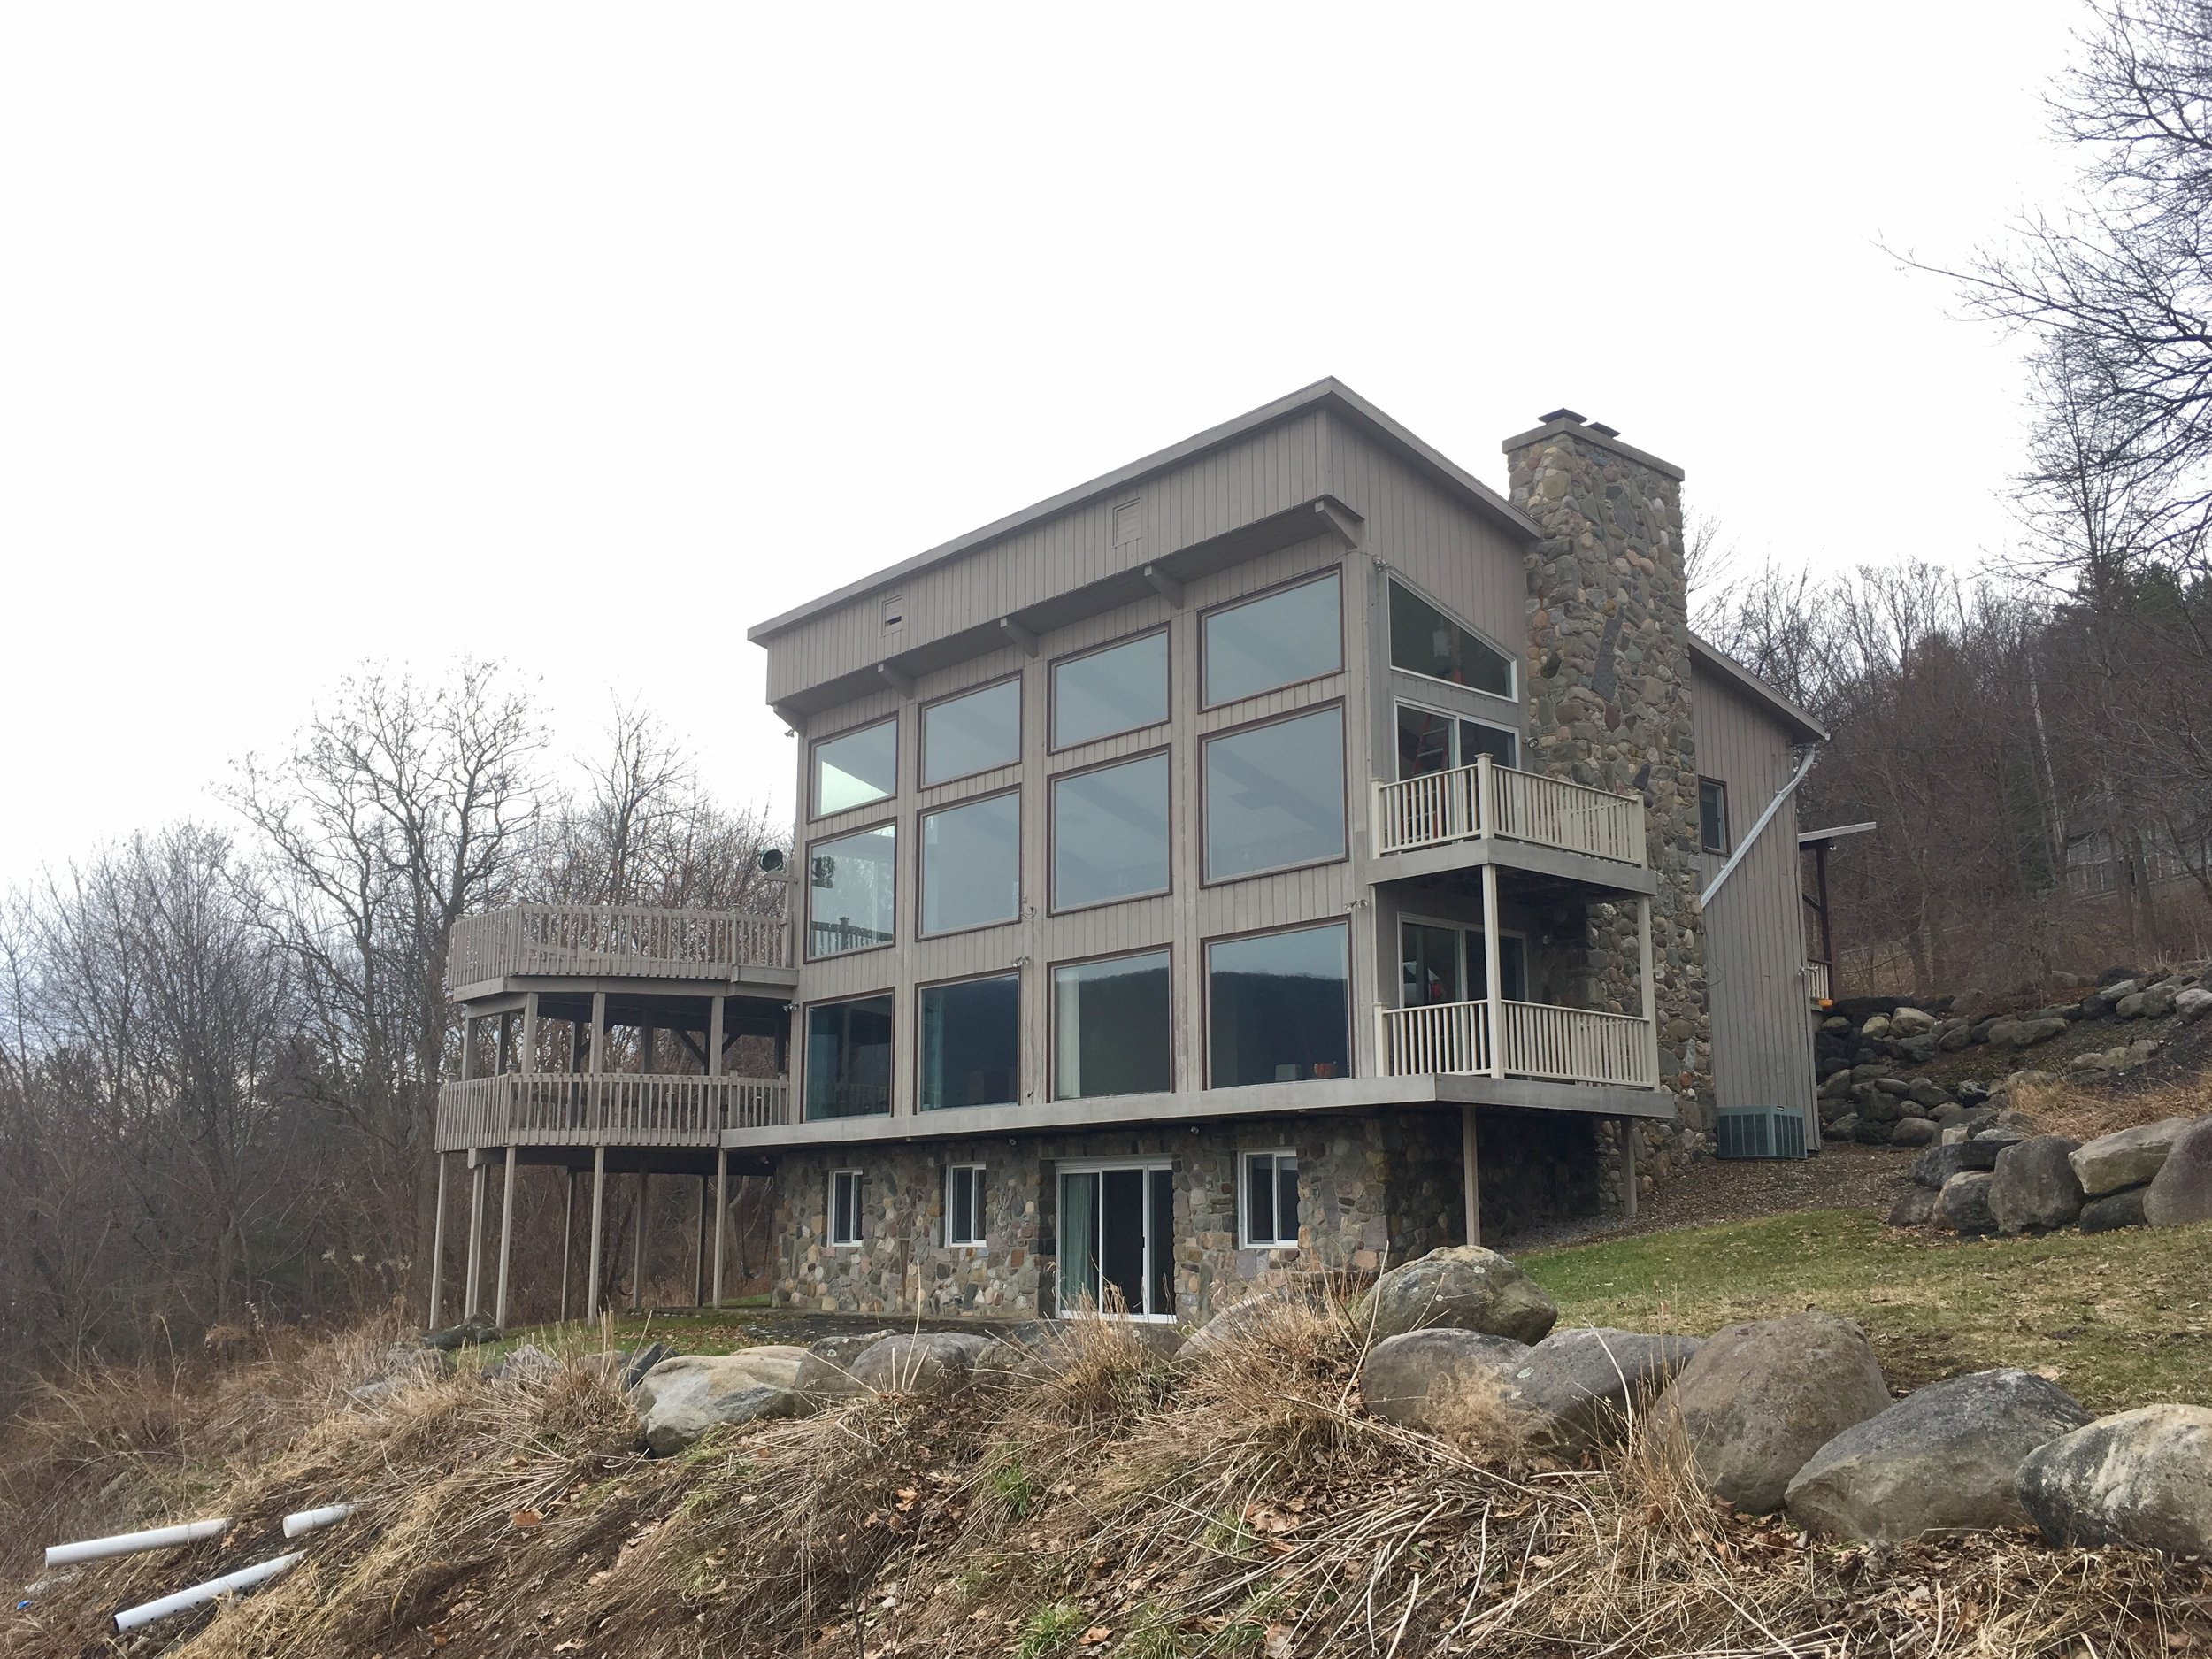 Sarah Welch, Howard Hanna, 6765 State Route 21, Canandaigua, Canandaigua lake, finger lakes, naples, S Bristol.jpg